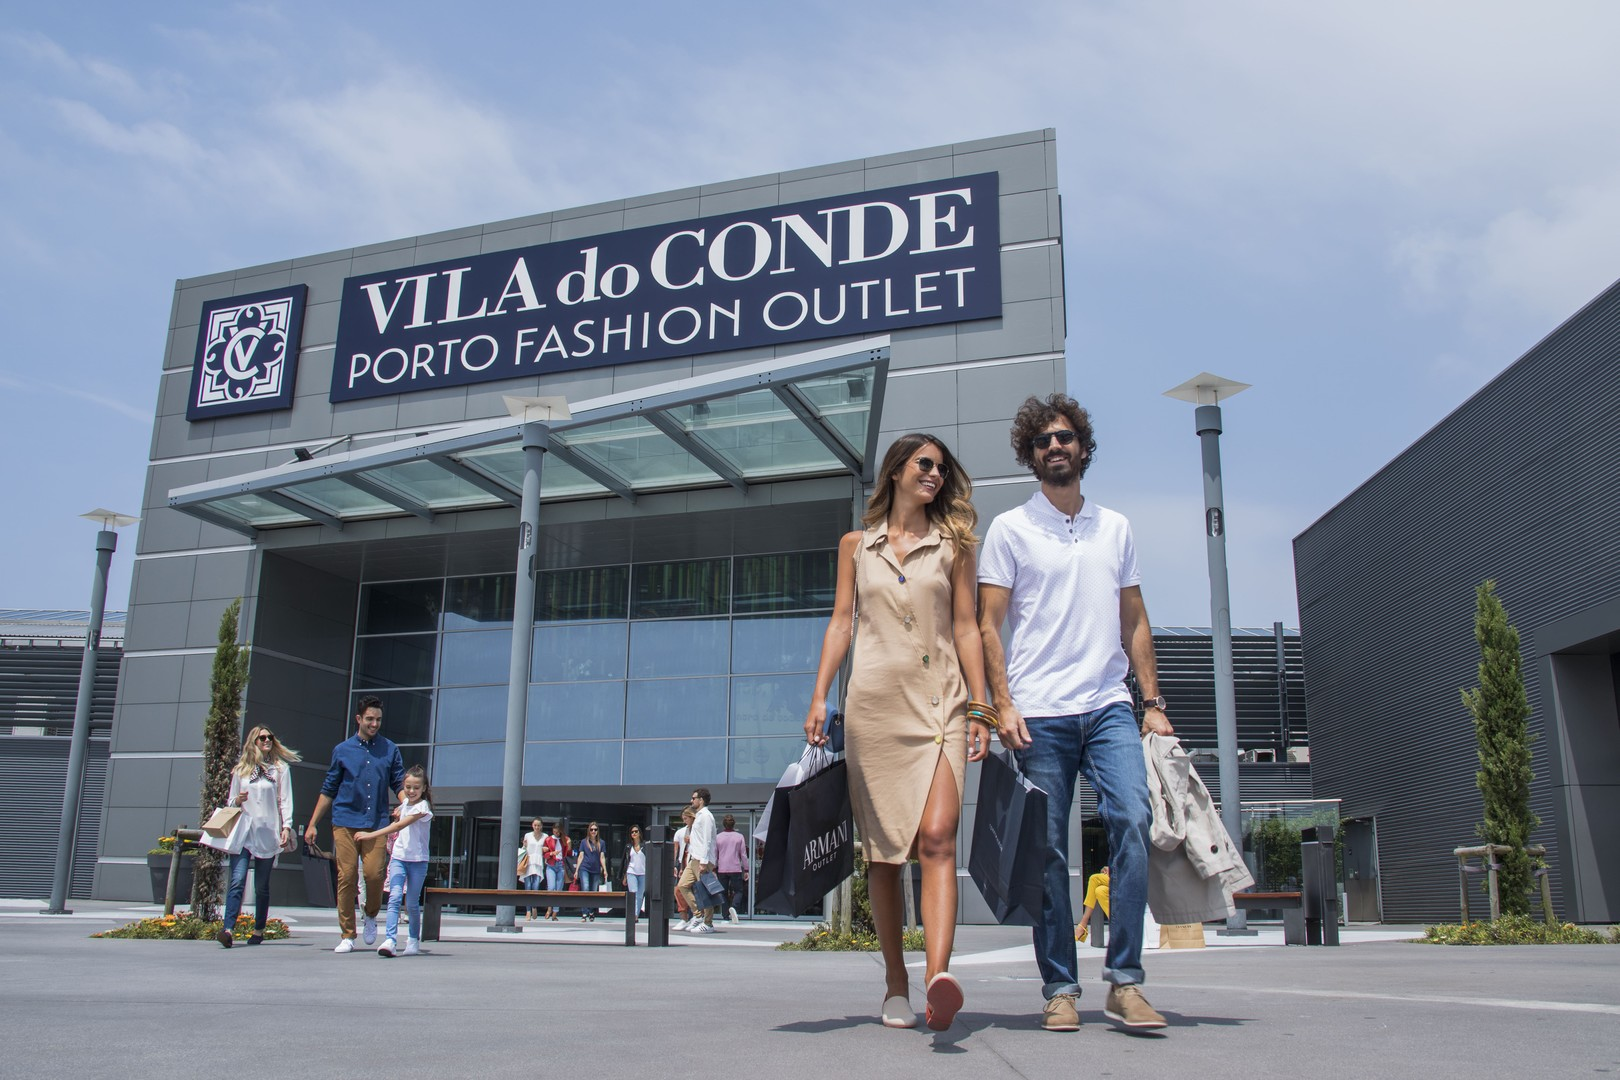 Vila Do Conde Porto Fashion Outlet Via Outlets